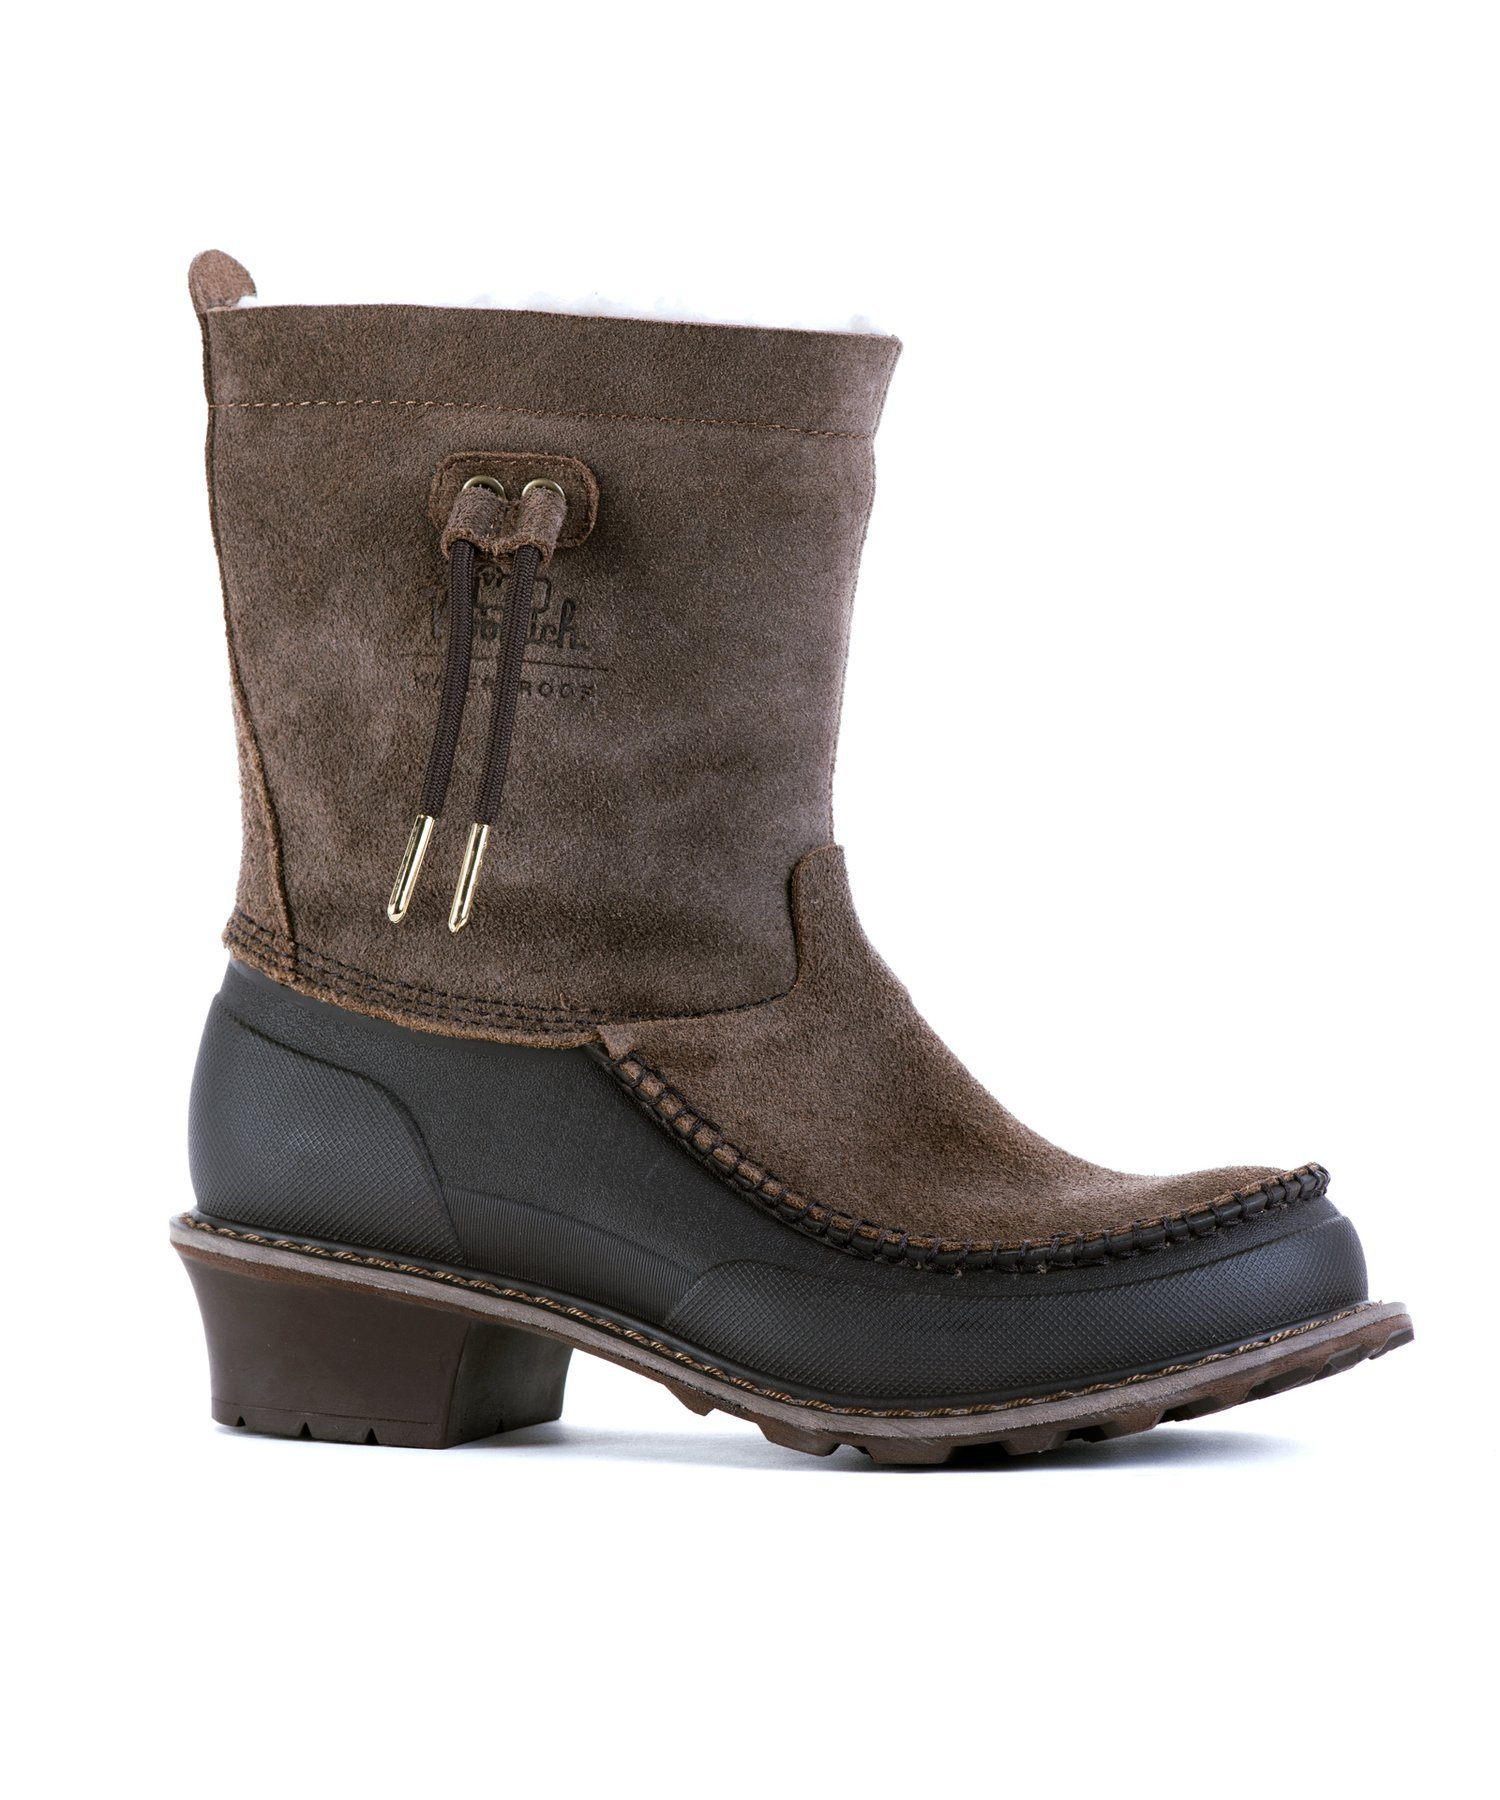 Woolrich Women's Fully Wooly Slip Waterproof Boots, JAVA (Brown), Size 9H